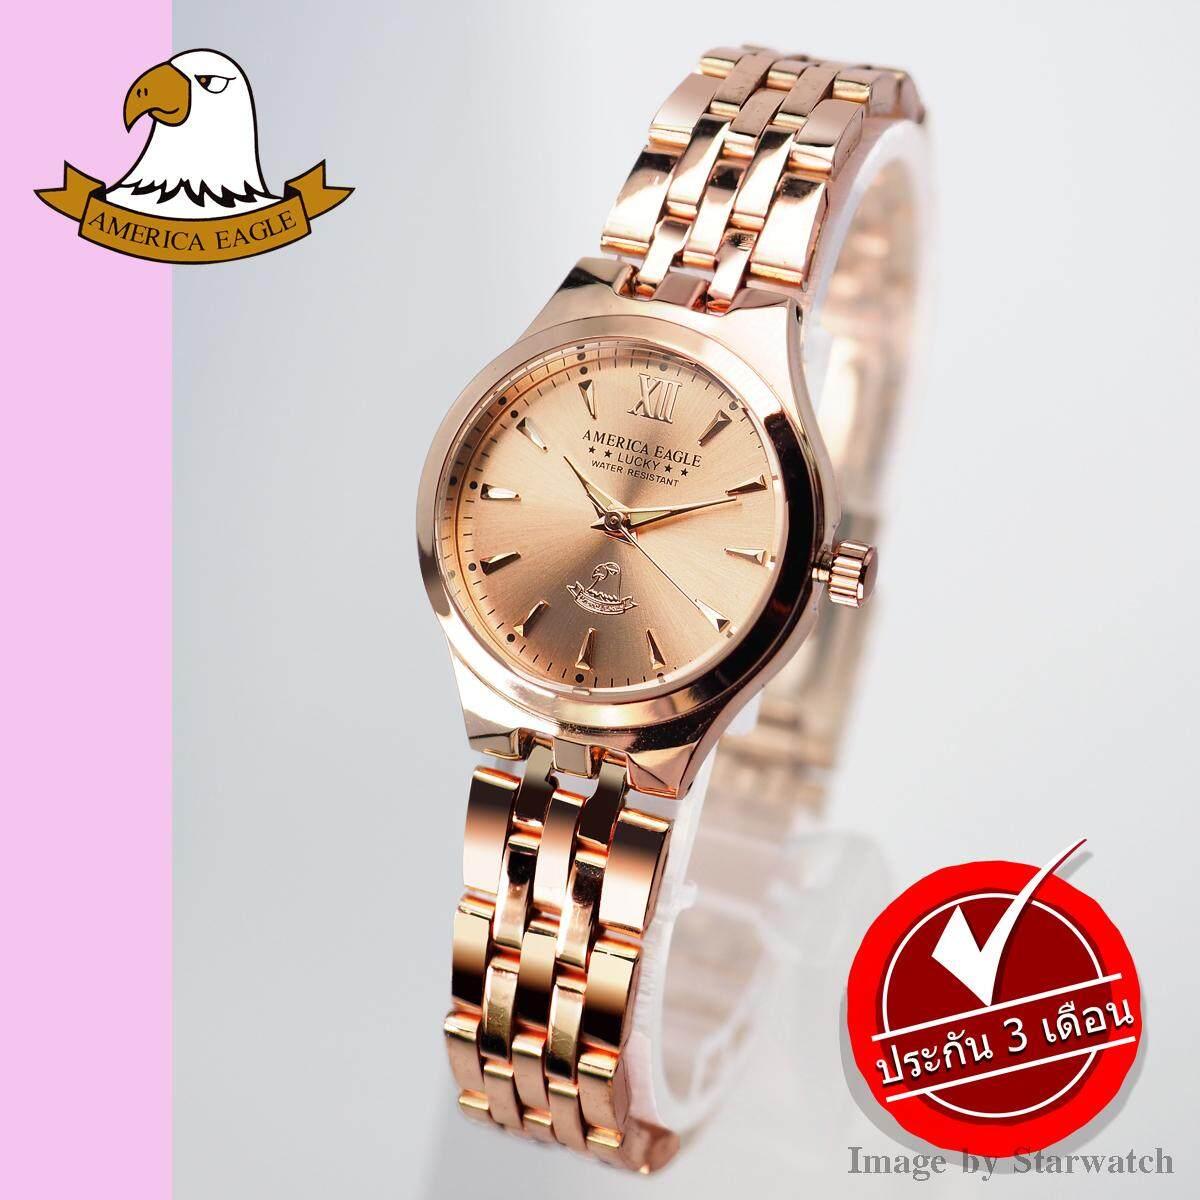 America Eagle นาฬิกาข้อมือผู้หญิง สายสแตนเลส รุ่น Ae021l - Pink Gold/pink Gold By Starwatch.